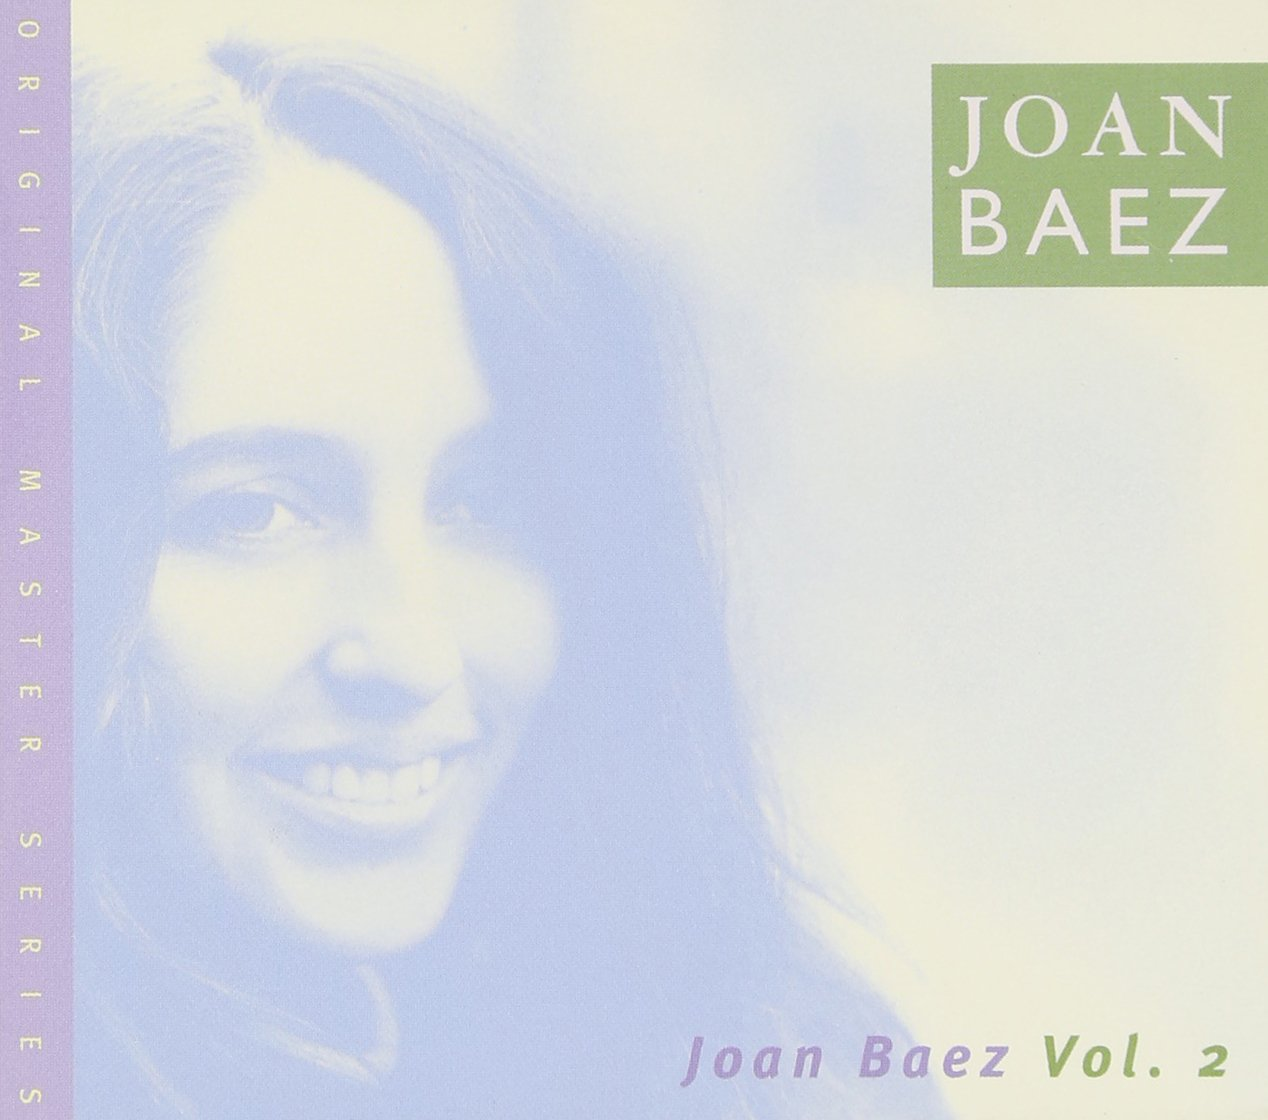 Joan Baez, Vol. II